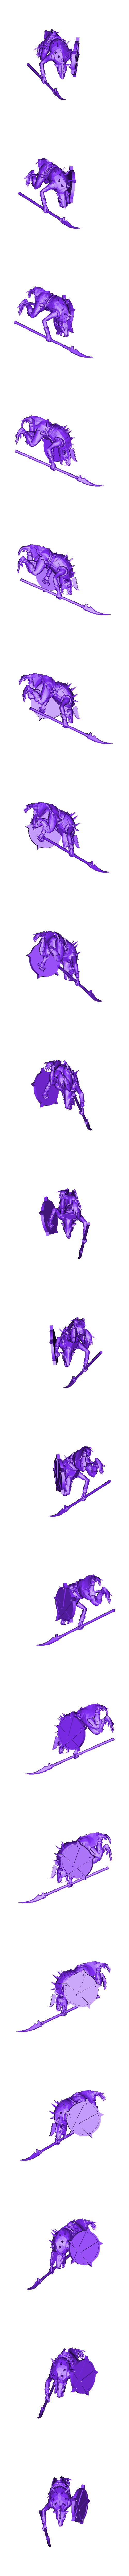 Clanrat_Spear_15.stl Download free 3MF file Gangsta Rats • 3D printer template, EmanG